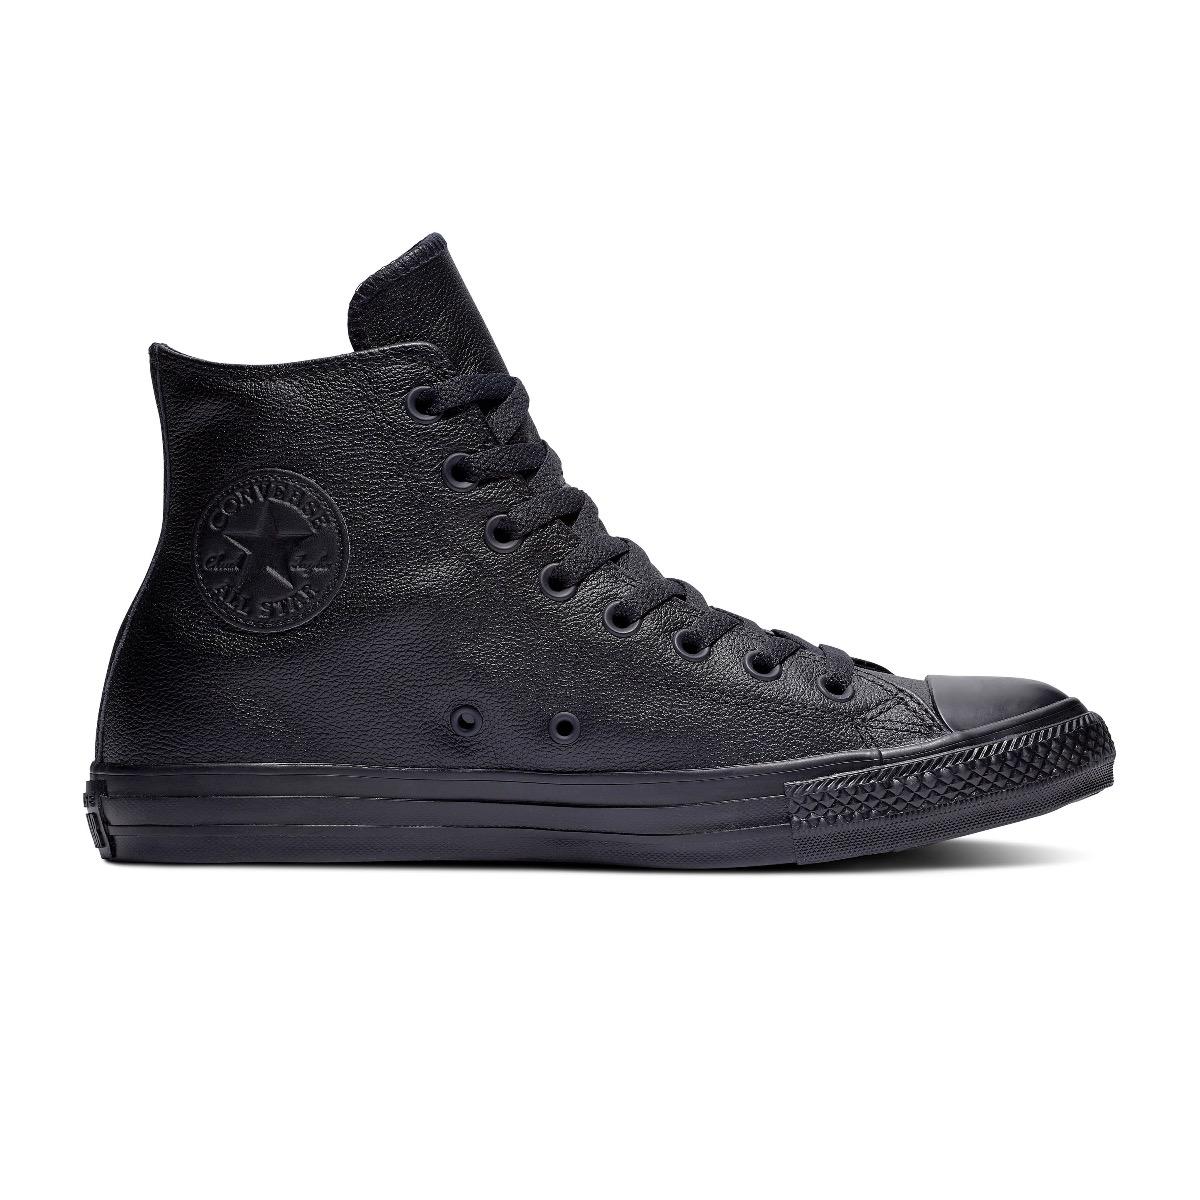 Converse All Stars Leather Hoog 135251C Zwart